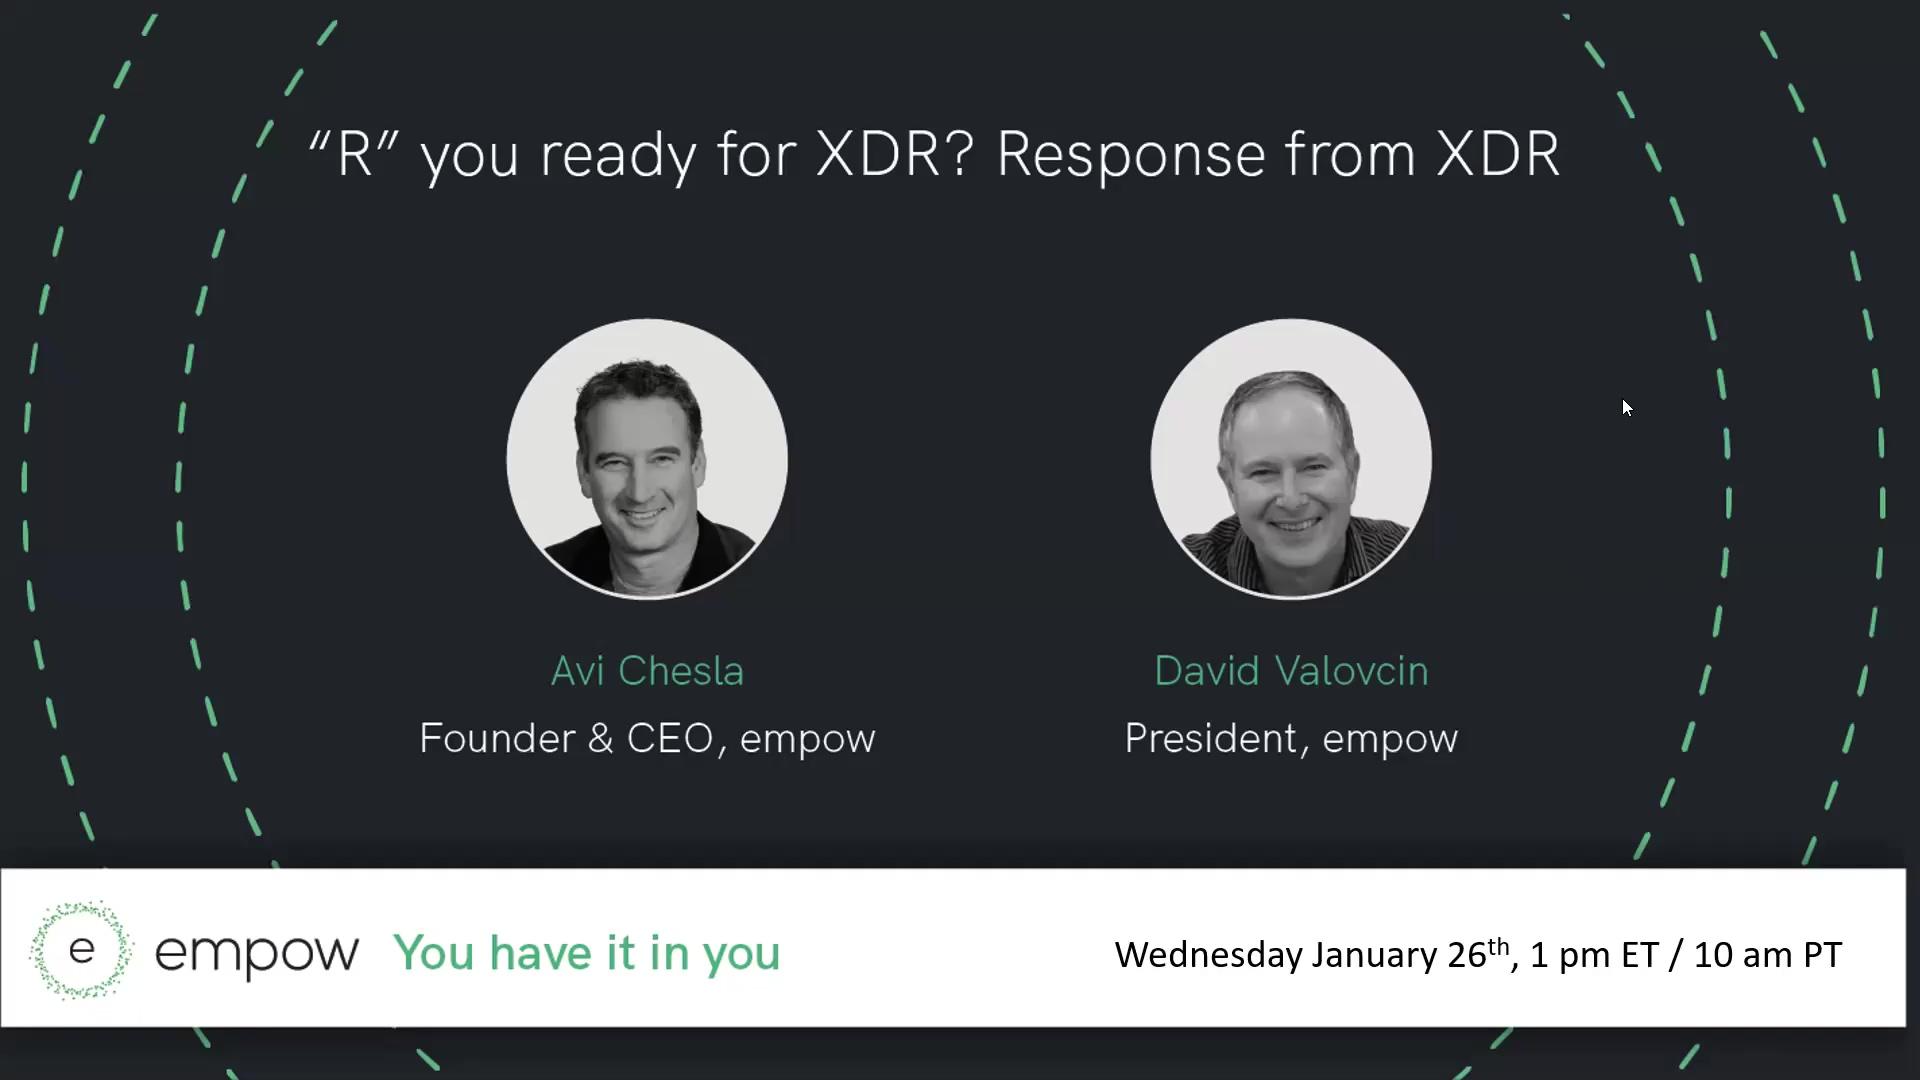 Response XDR webinar